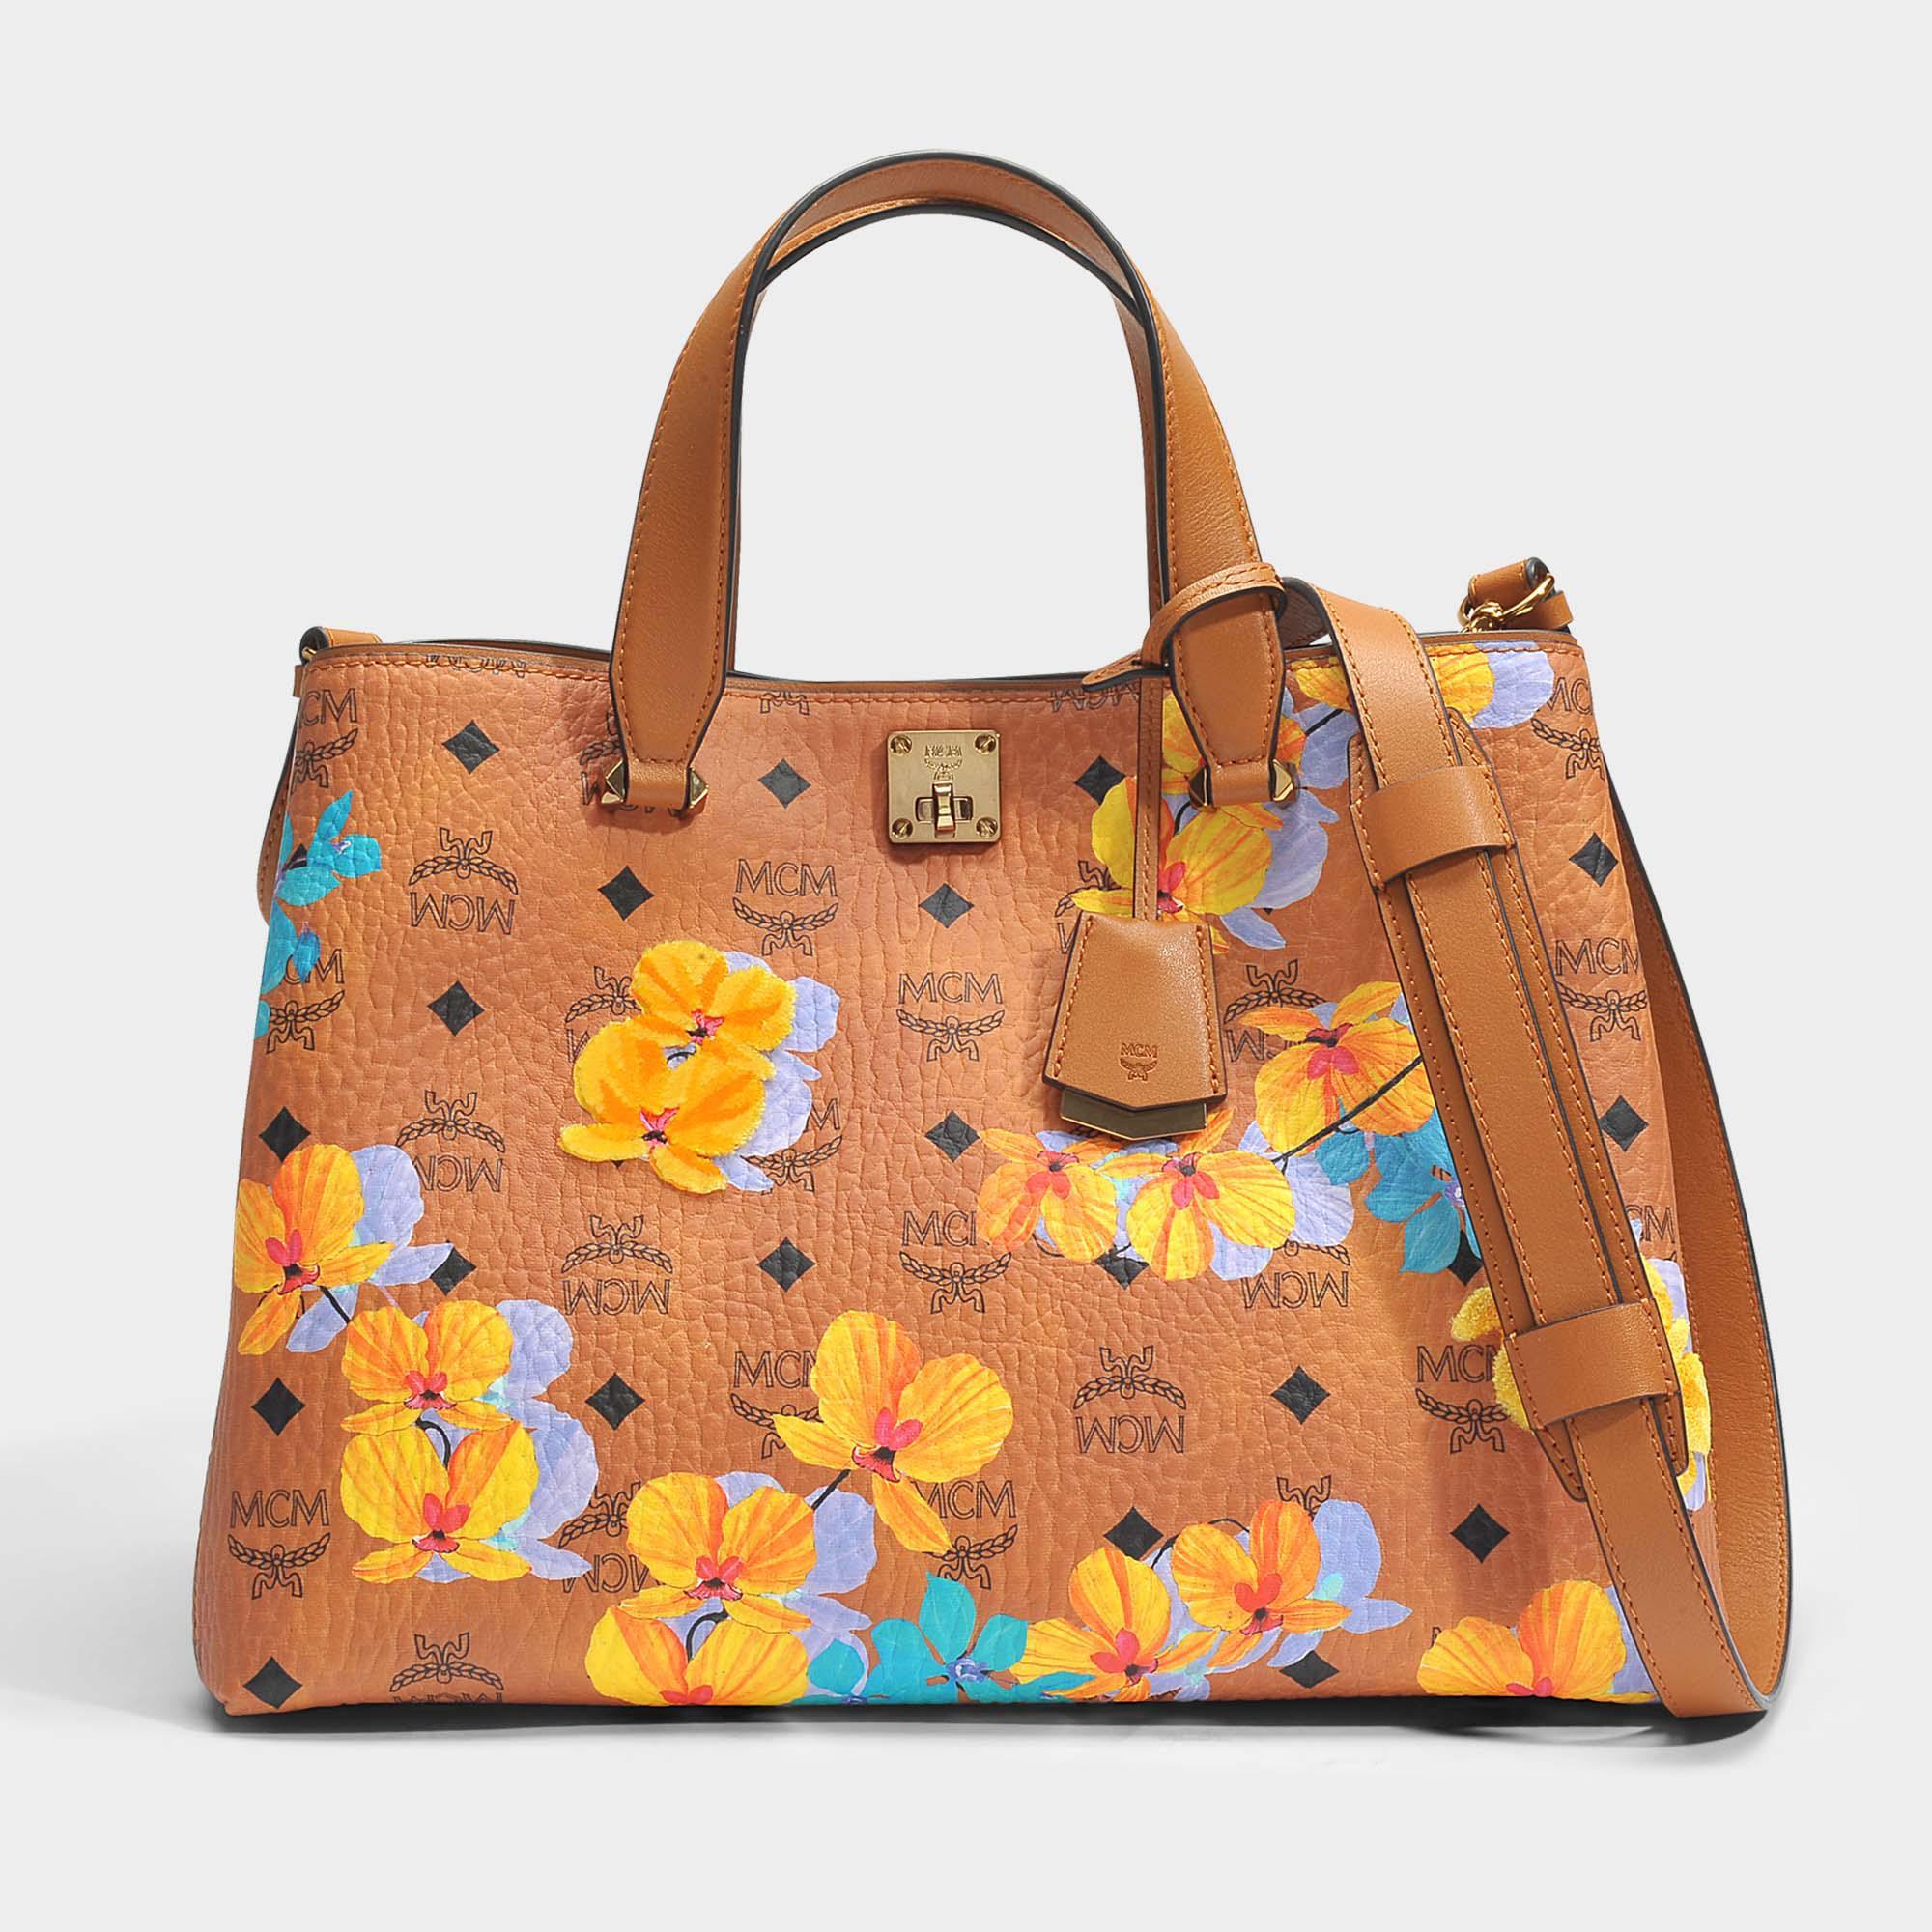 829dd390f MCM Flower Crossbody Tote Bag In Cognac Coated Cotton - Lyst